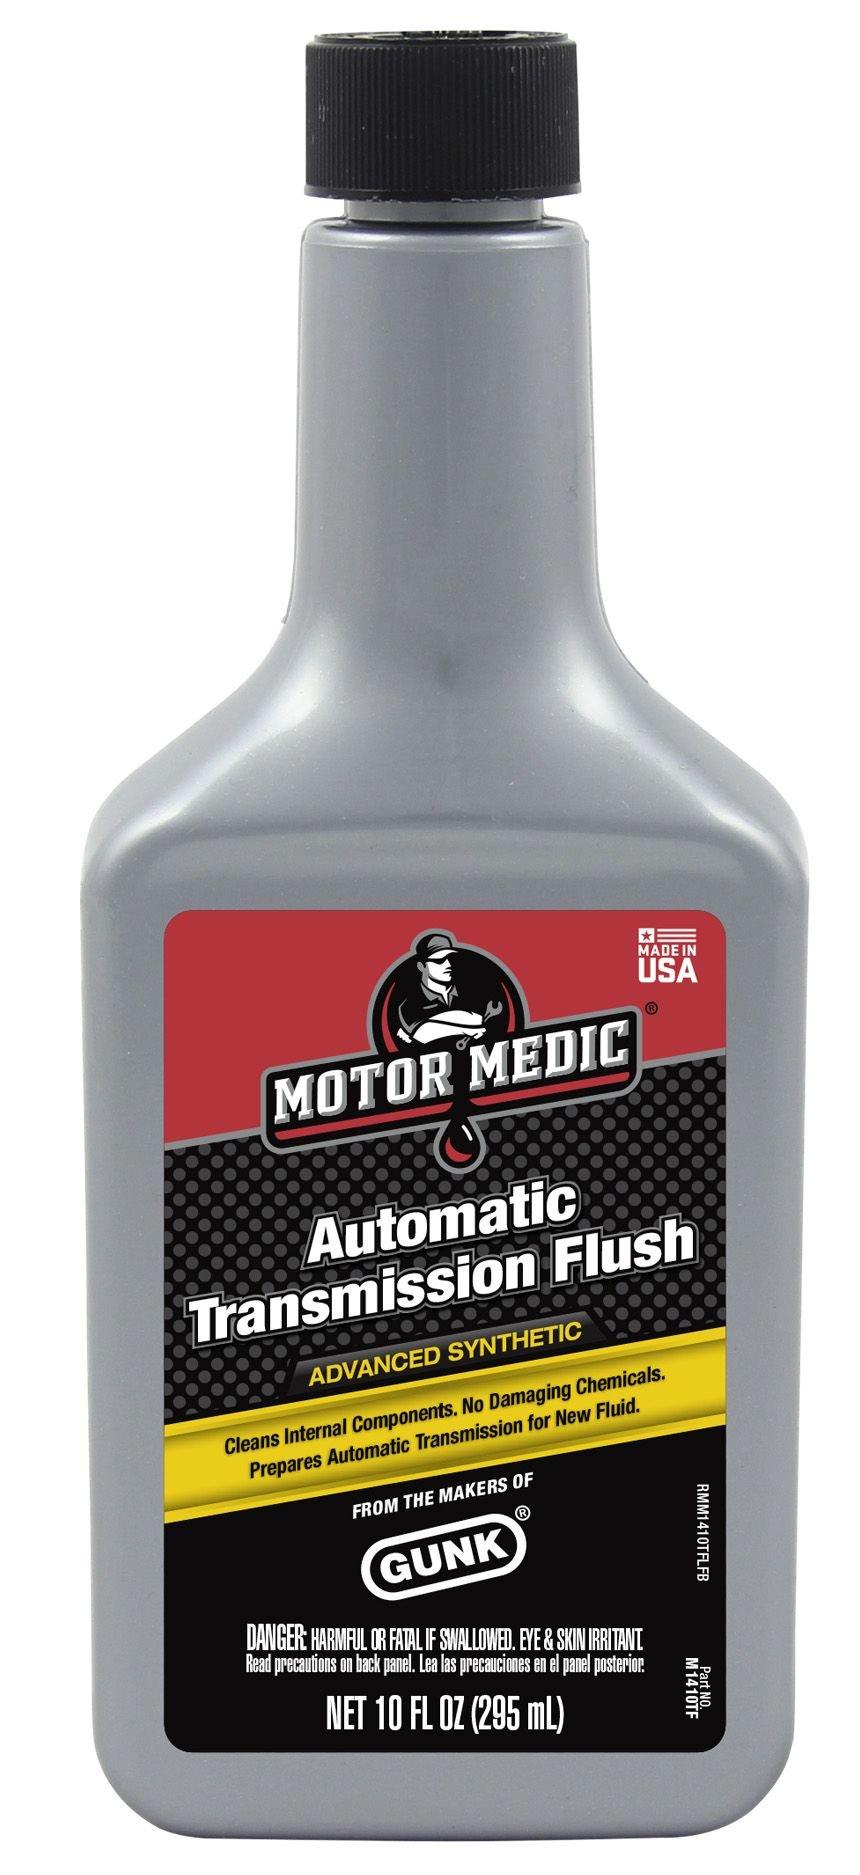 Niteo Motor Medic M1410TF-12PK Synthetic Automatic Transmission Flush - 10 oz, (Case of 12) by Niteo